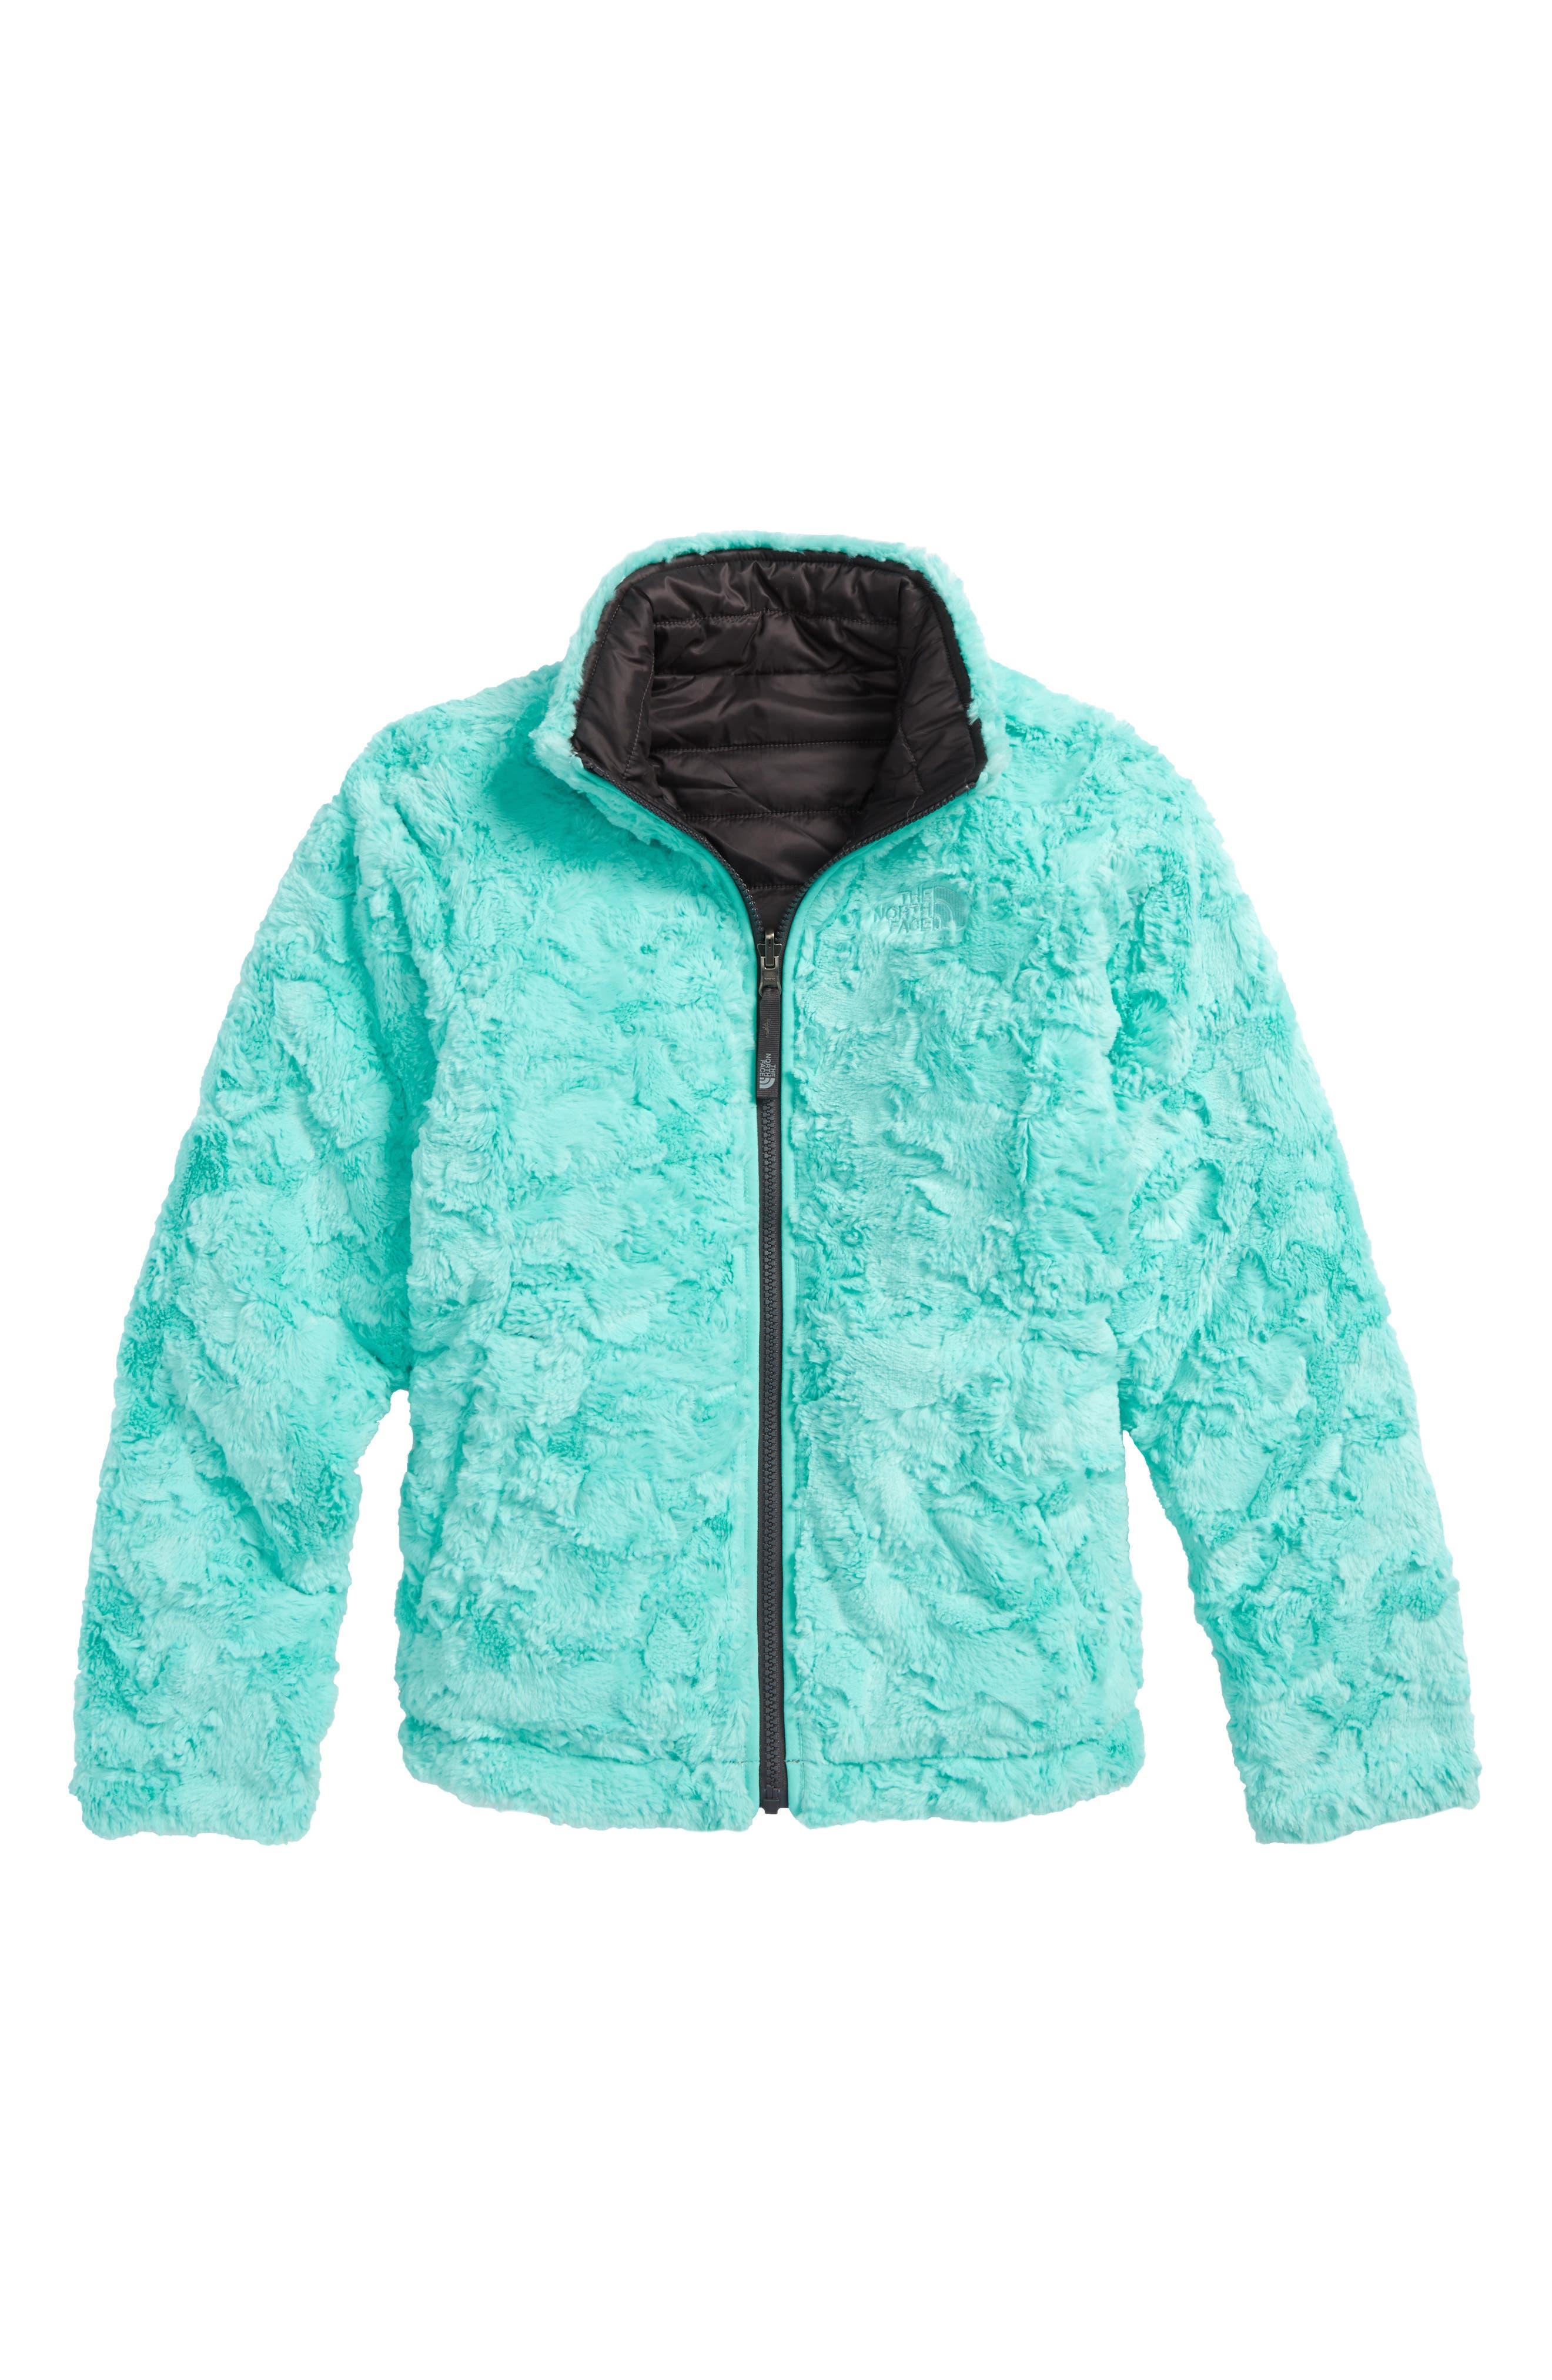 Mossbud Swirl Reversible Water Repellent Jacket,                             Alternate thumbnail 2, color,                             GRAPHITE GREY/ MINT BLUE